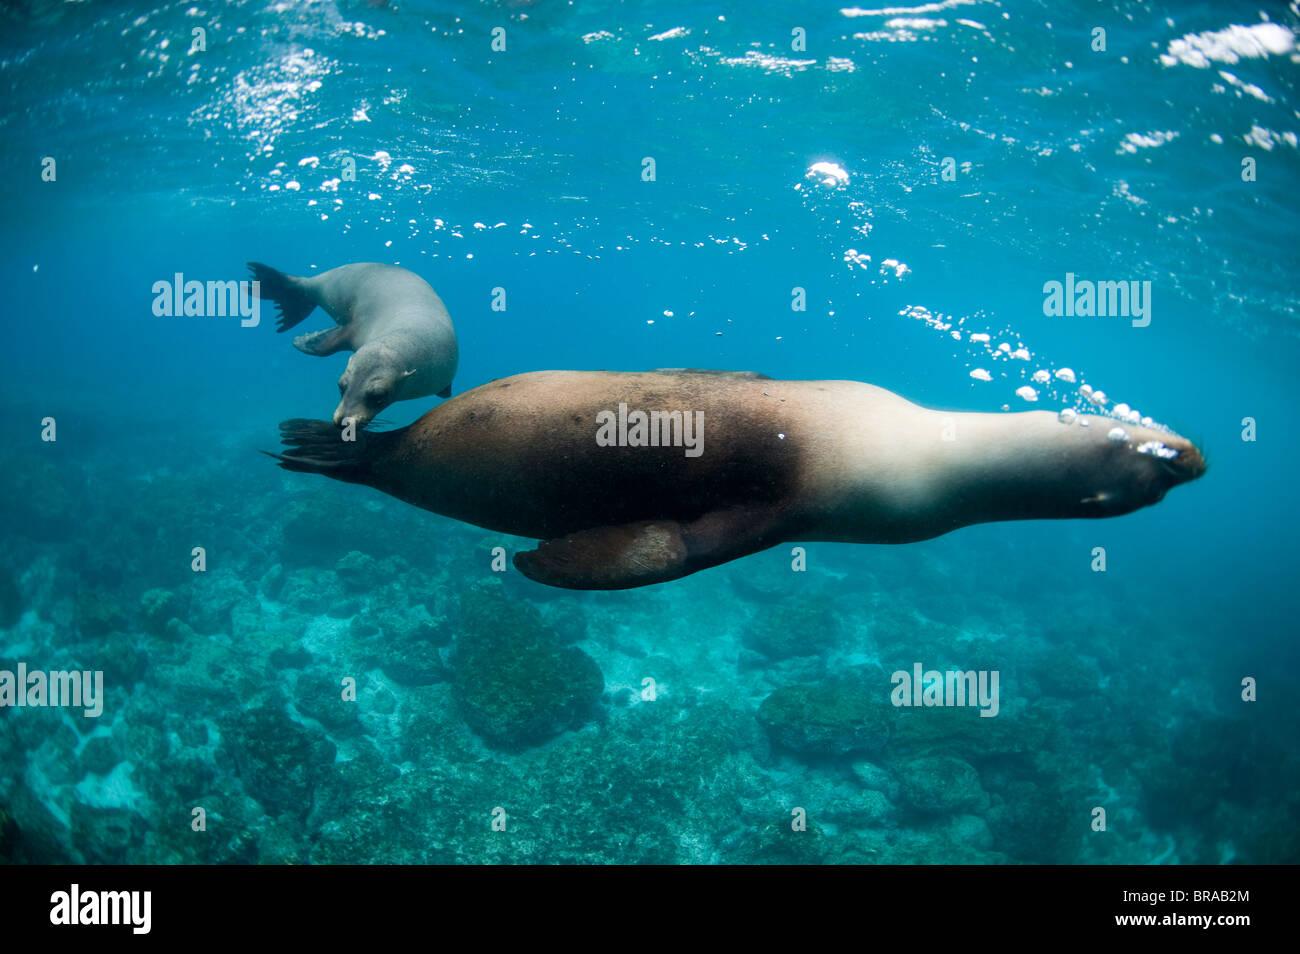 Two sea lions off Floreana Island, Galapagos, Ecuador, South America - Stock Image